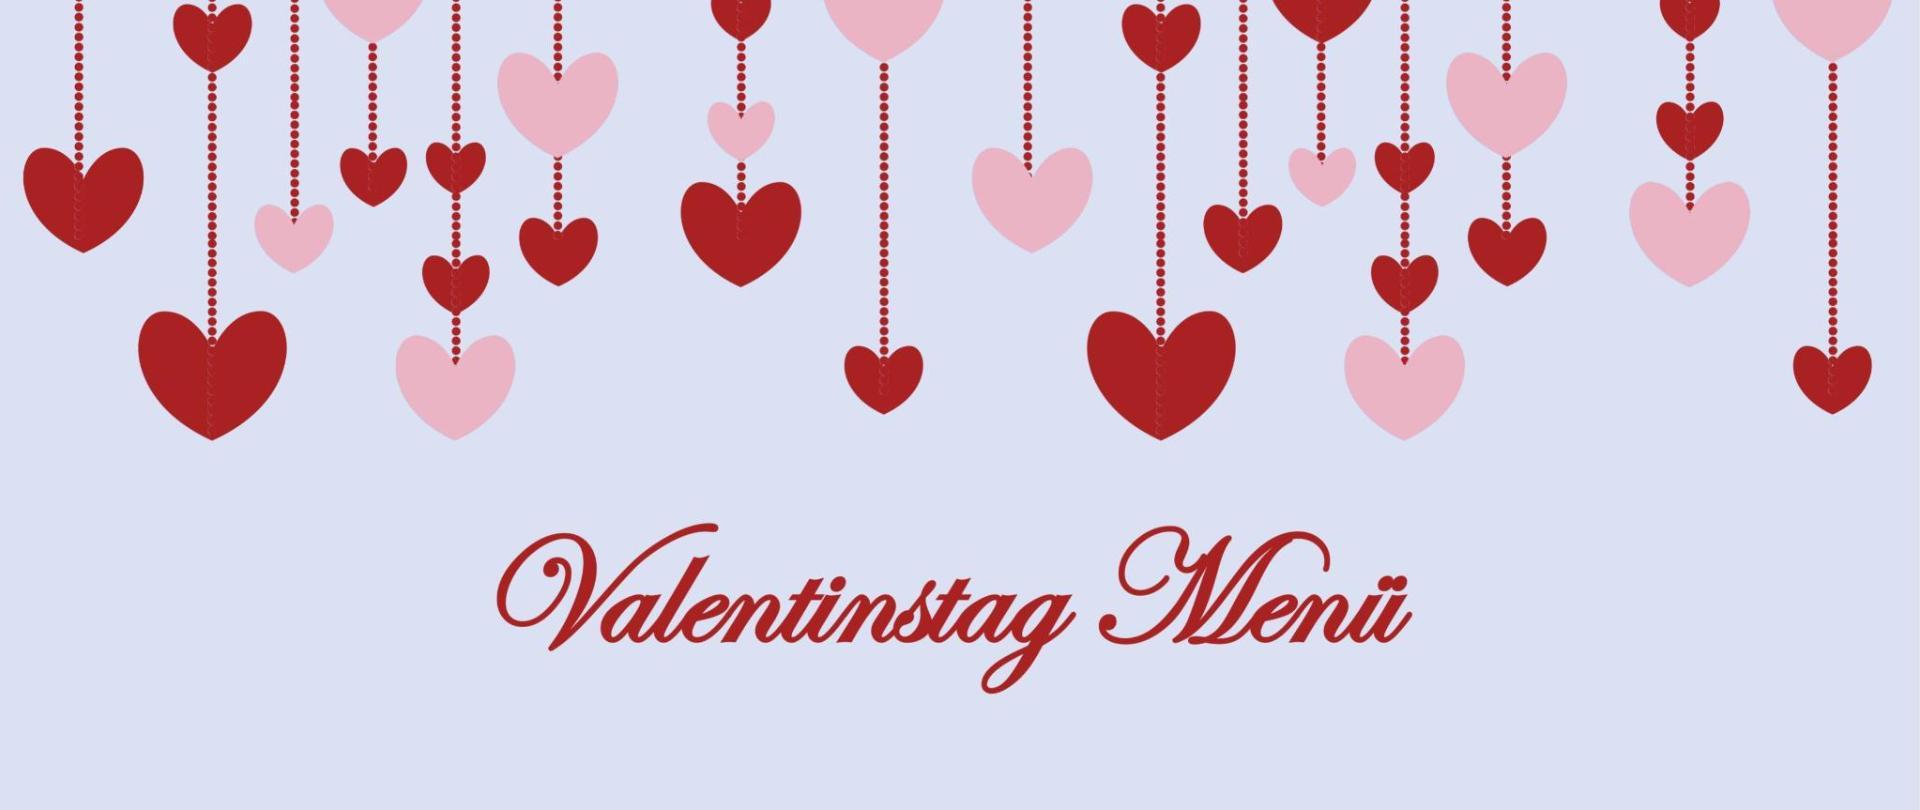 Website Valentinstag JPG.jpg